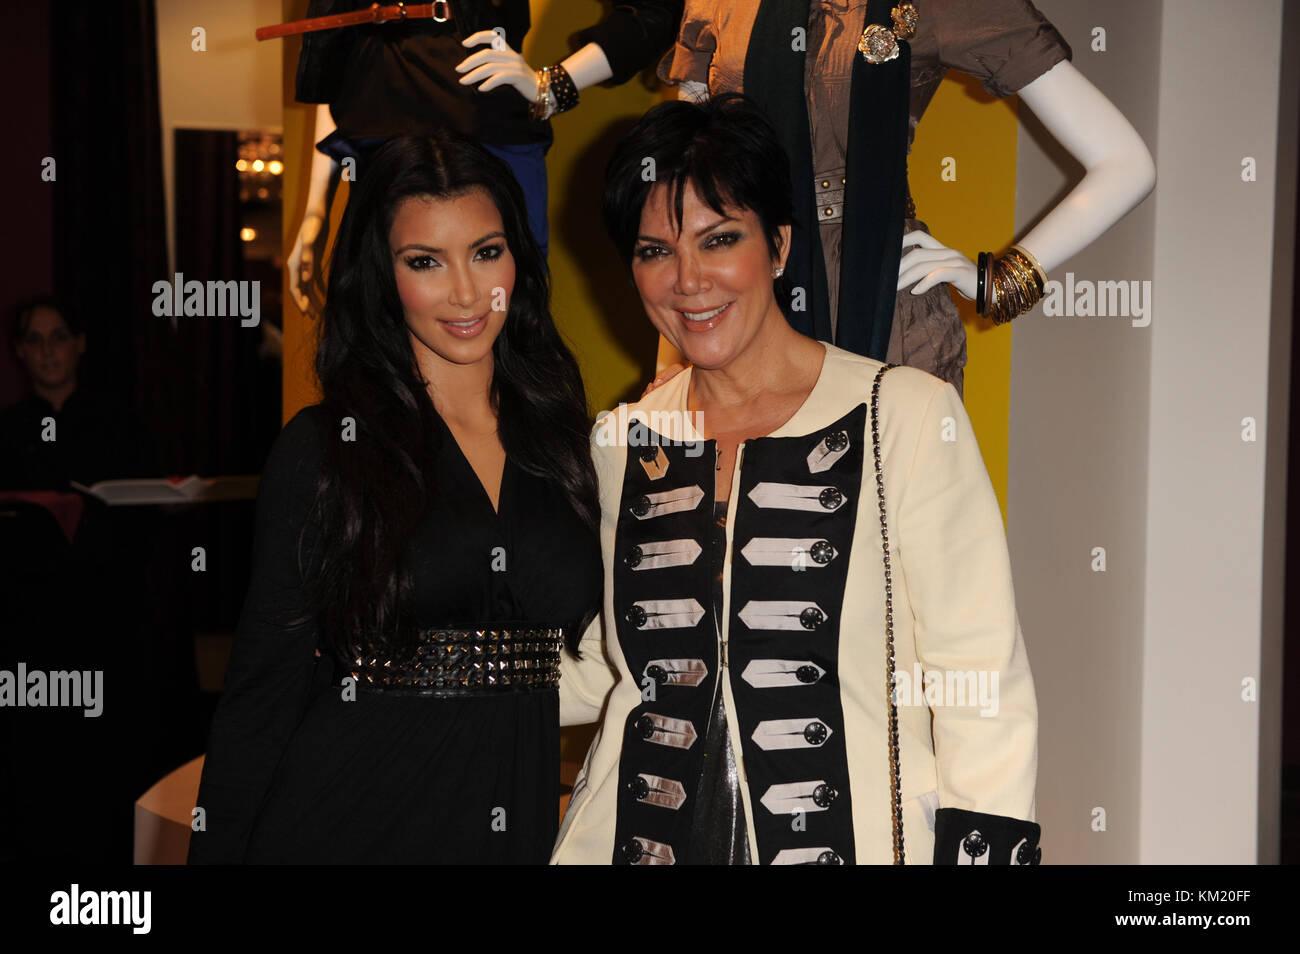 SMG_Kim Kardashian _Divorce_110111_17.JPG  SUNRISE- NOVEMBER 20: Media and reality show personality Kim Kardashian - Stock Image